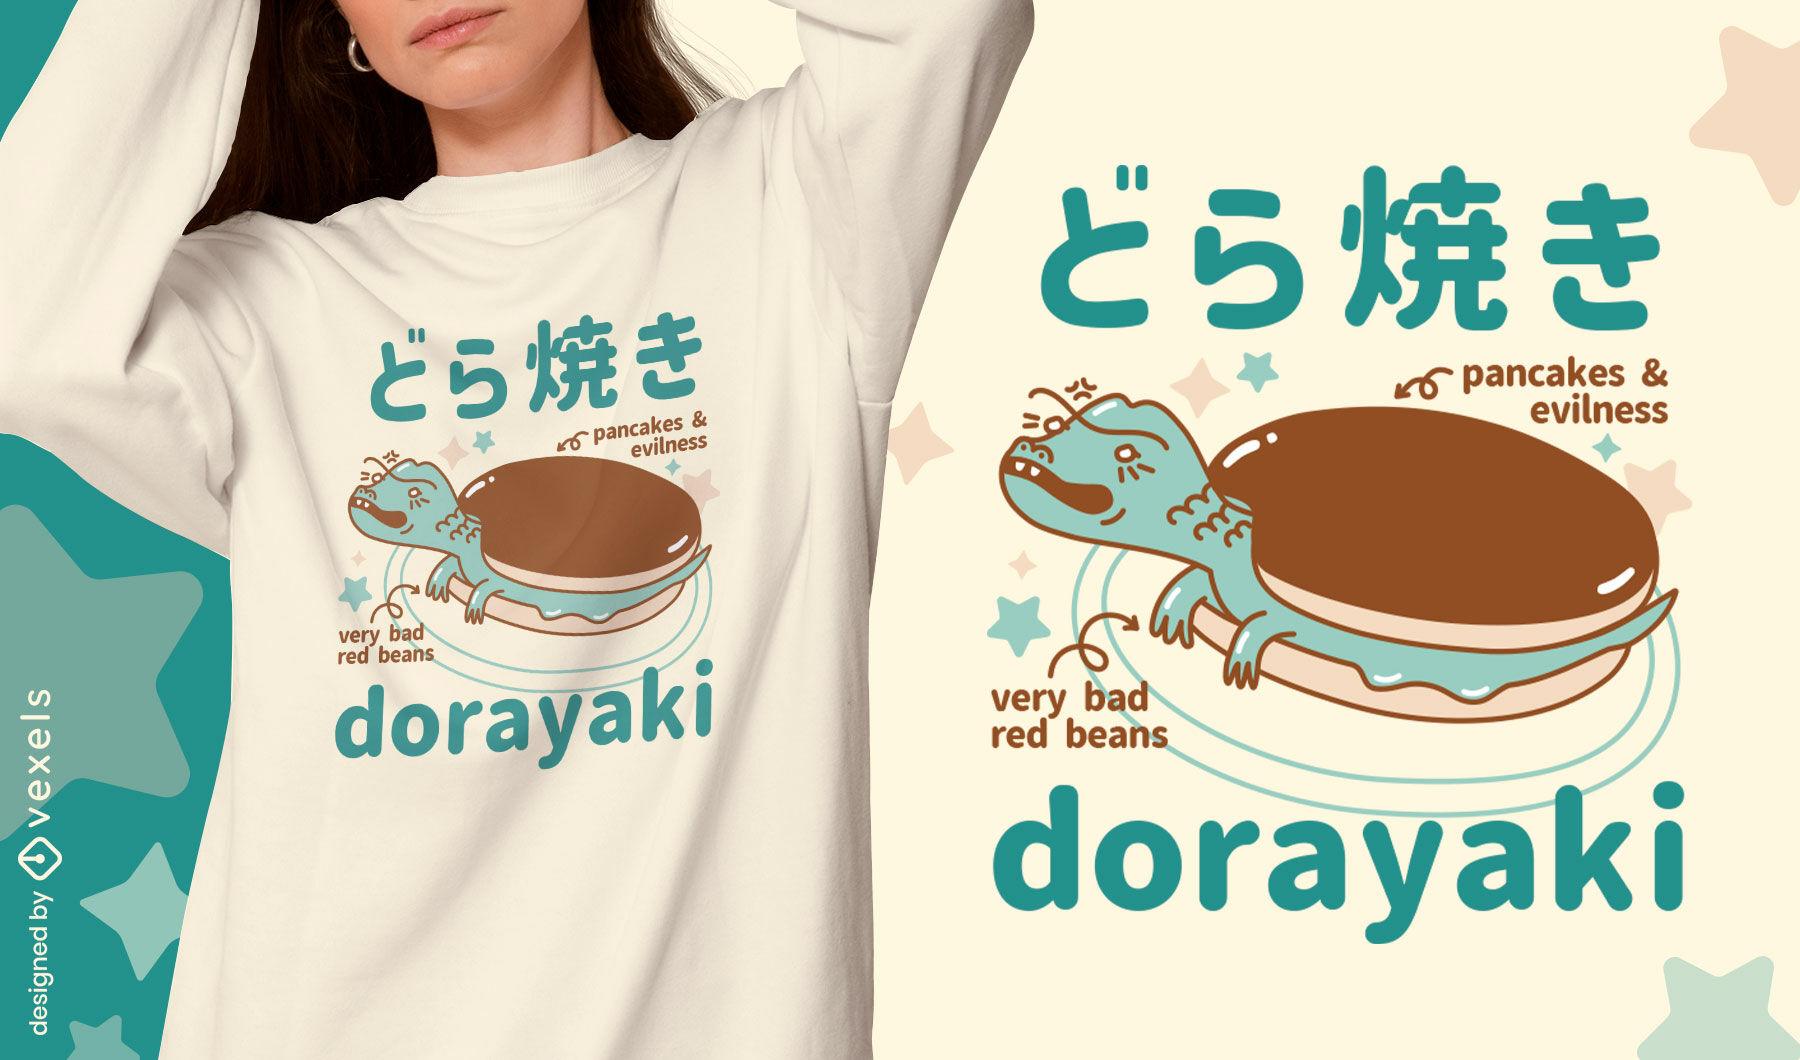 Japanese pancake monster t-shirt design